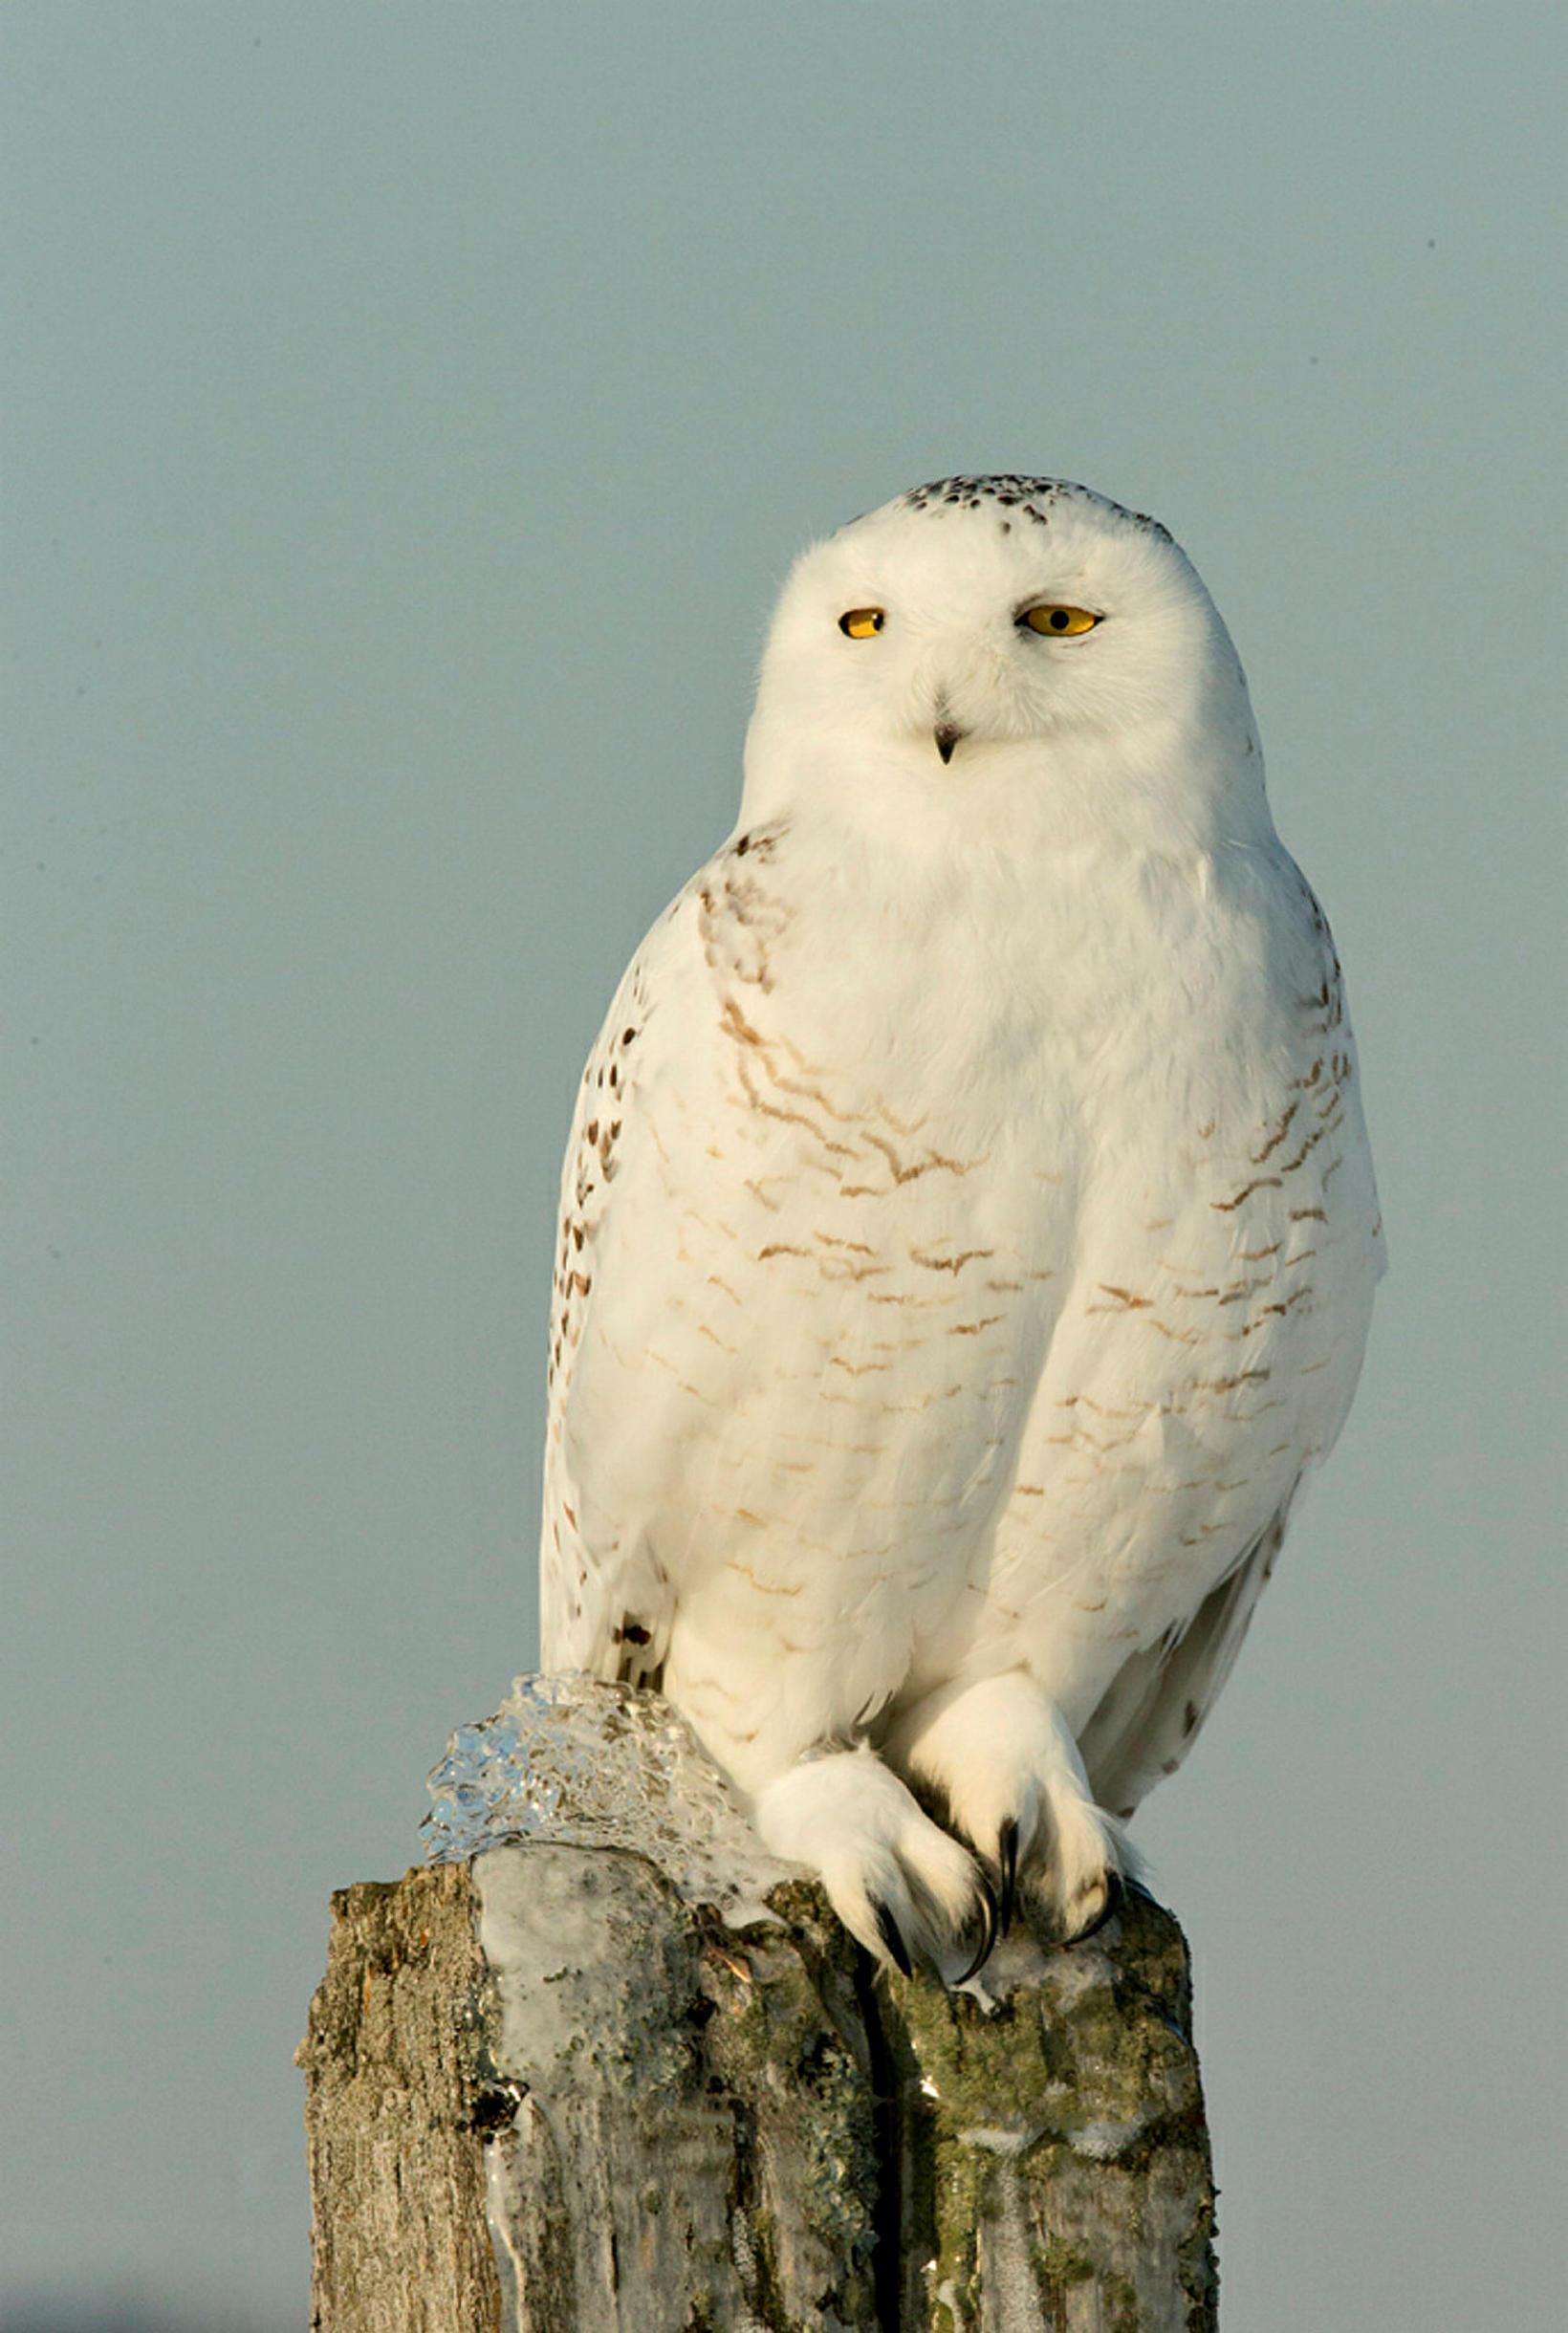 Snowy owl.